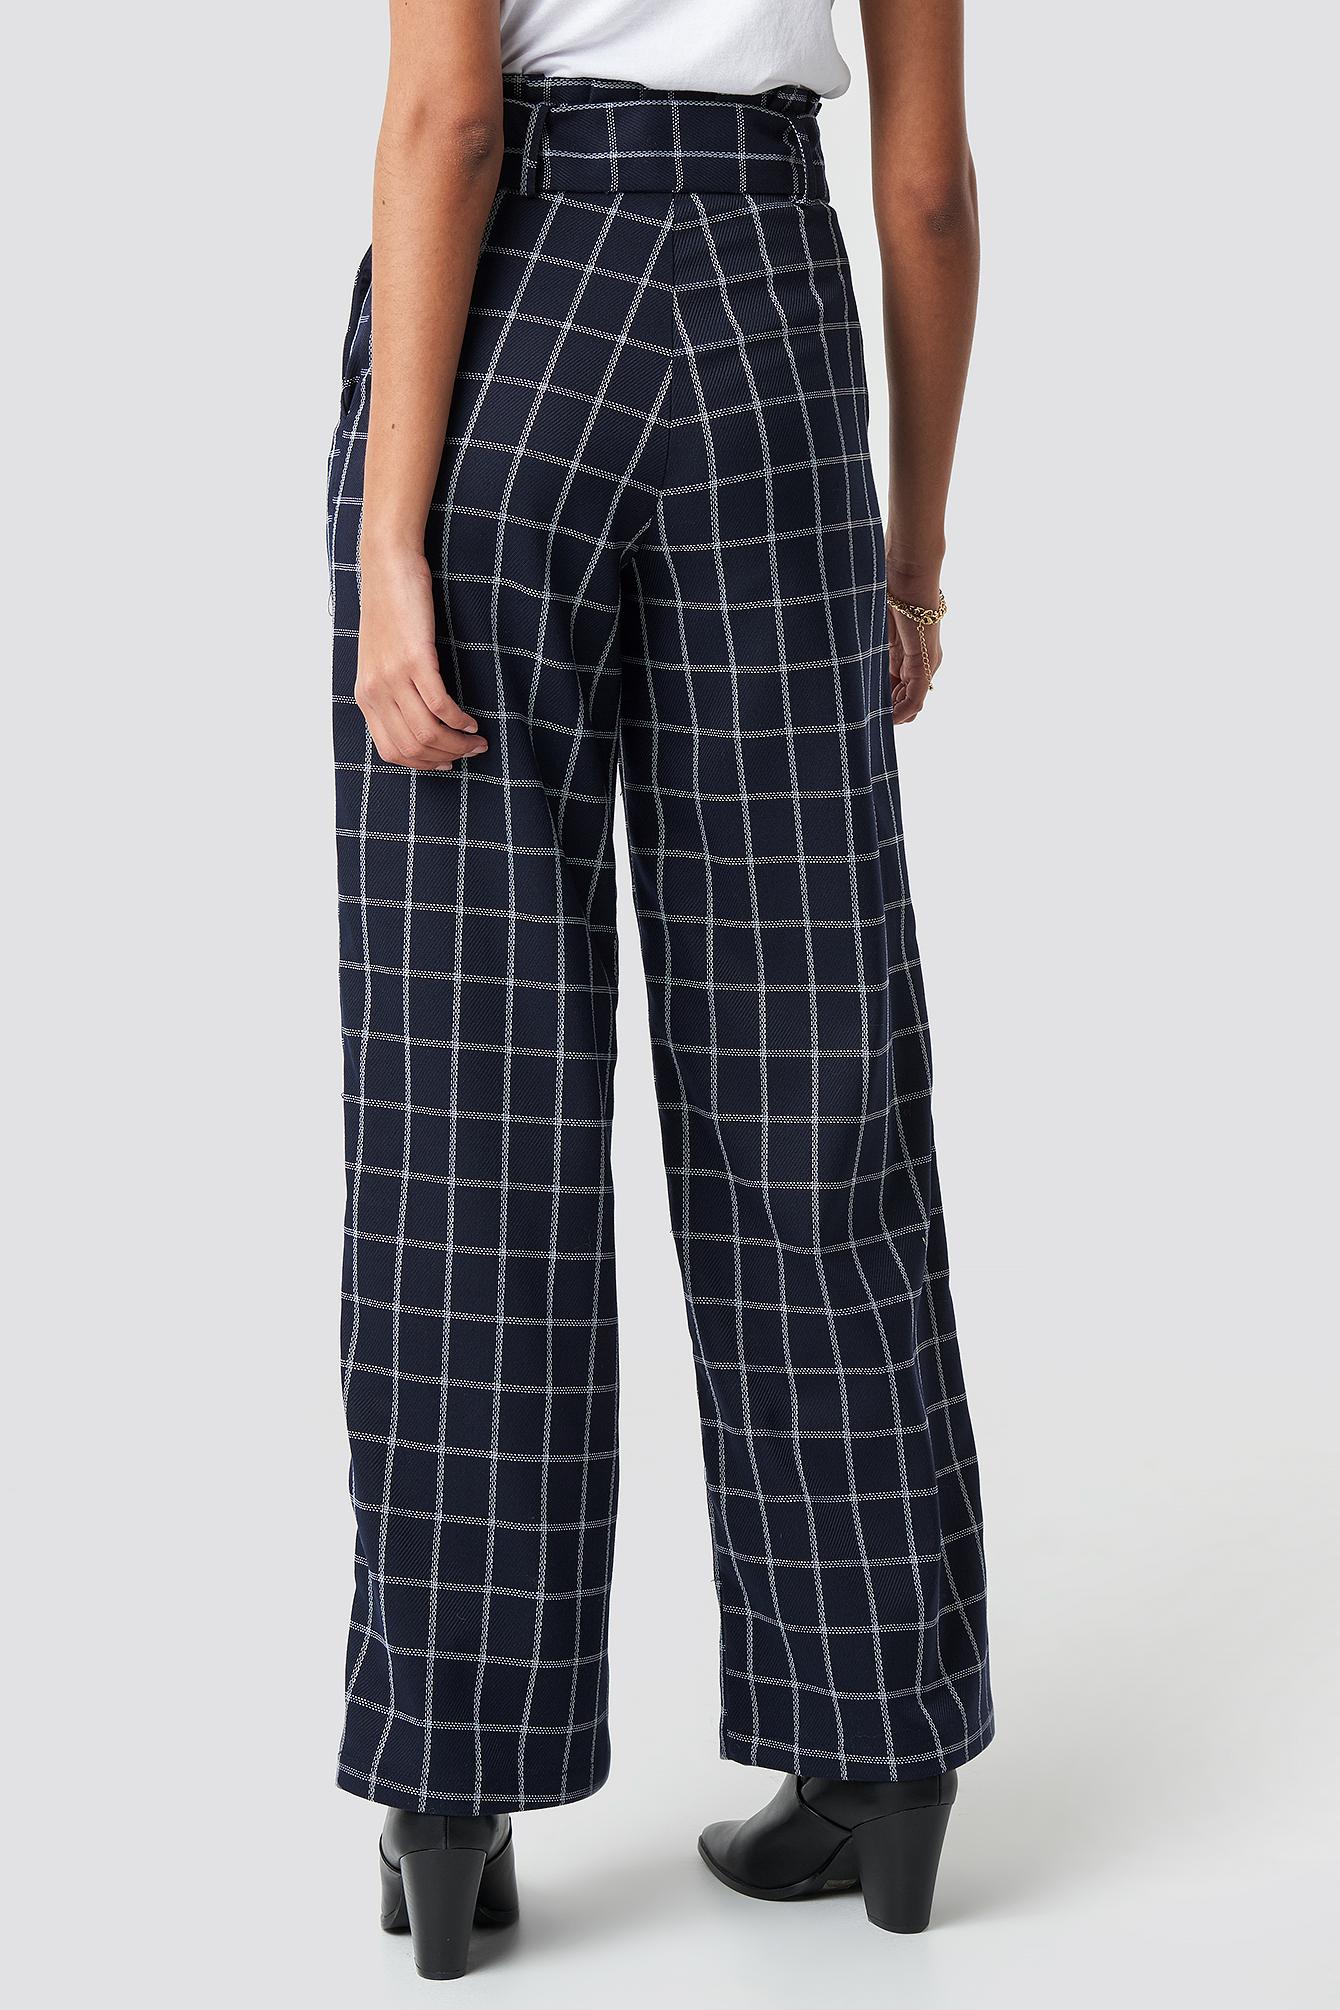 Paperbag Suit Pants NA-KD.COM